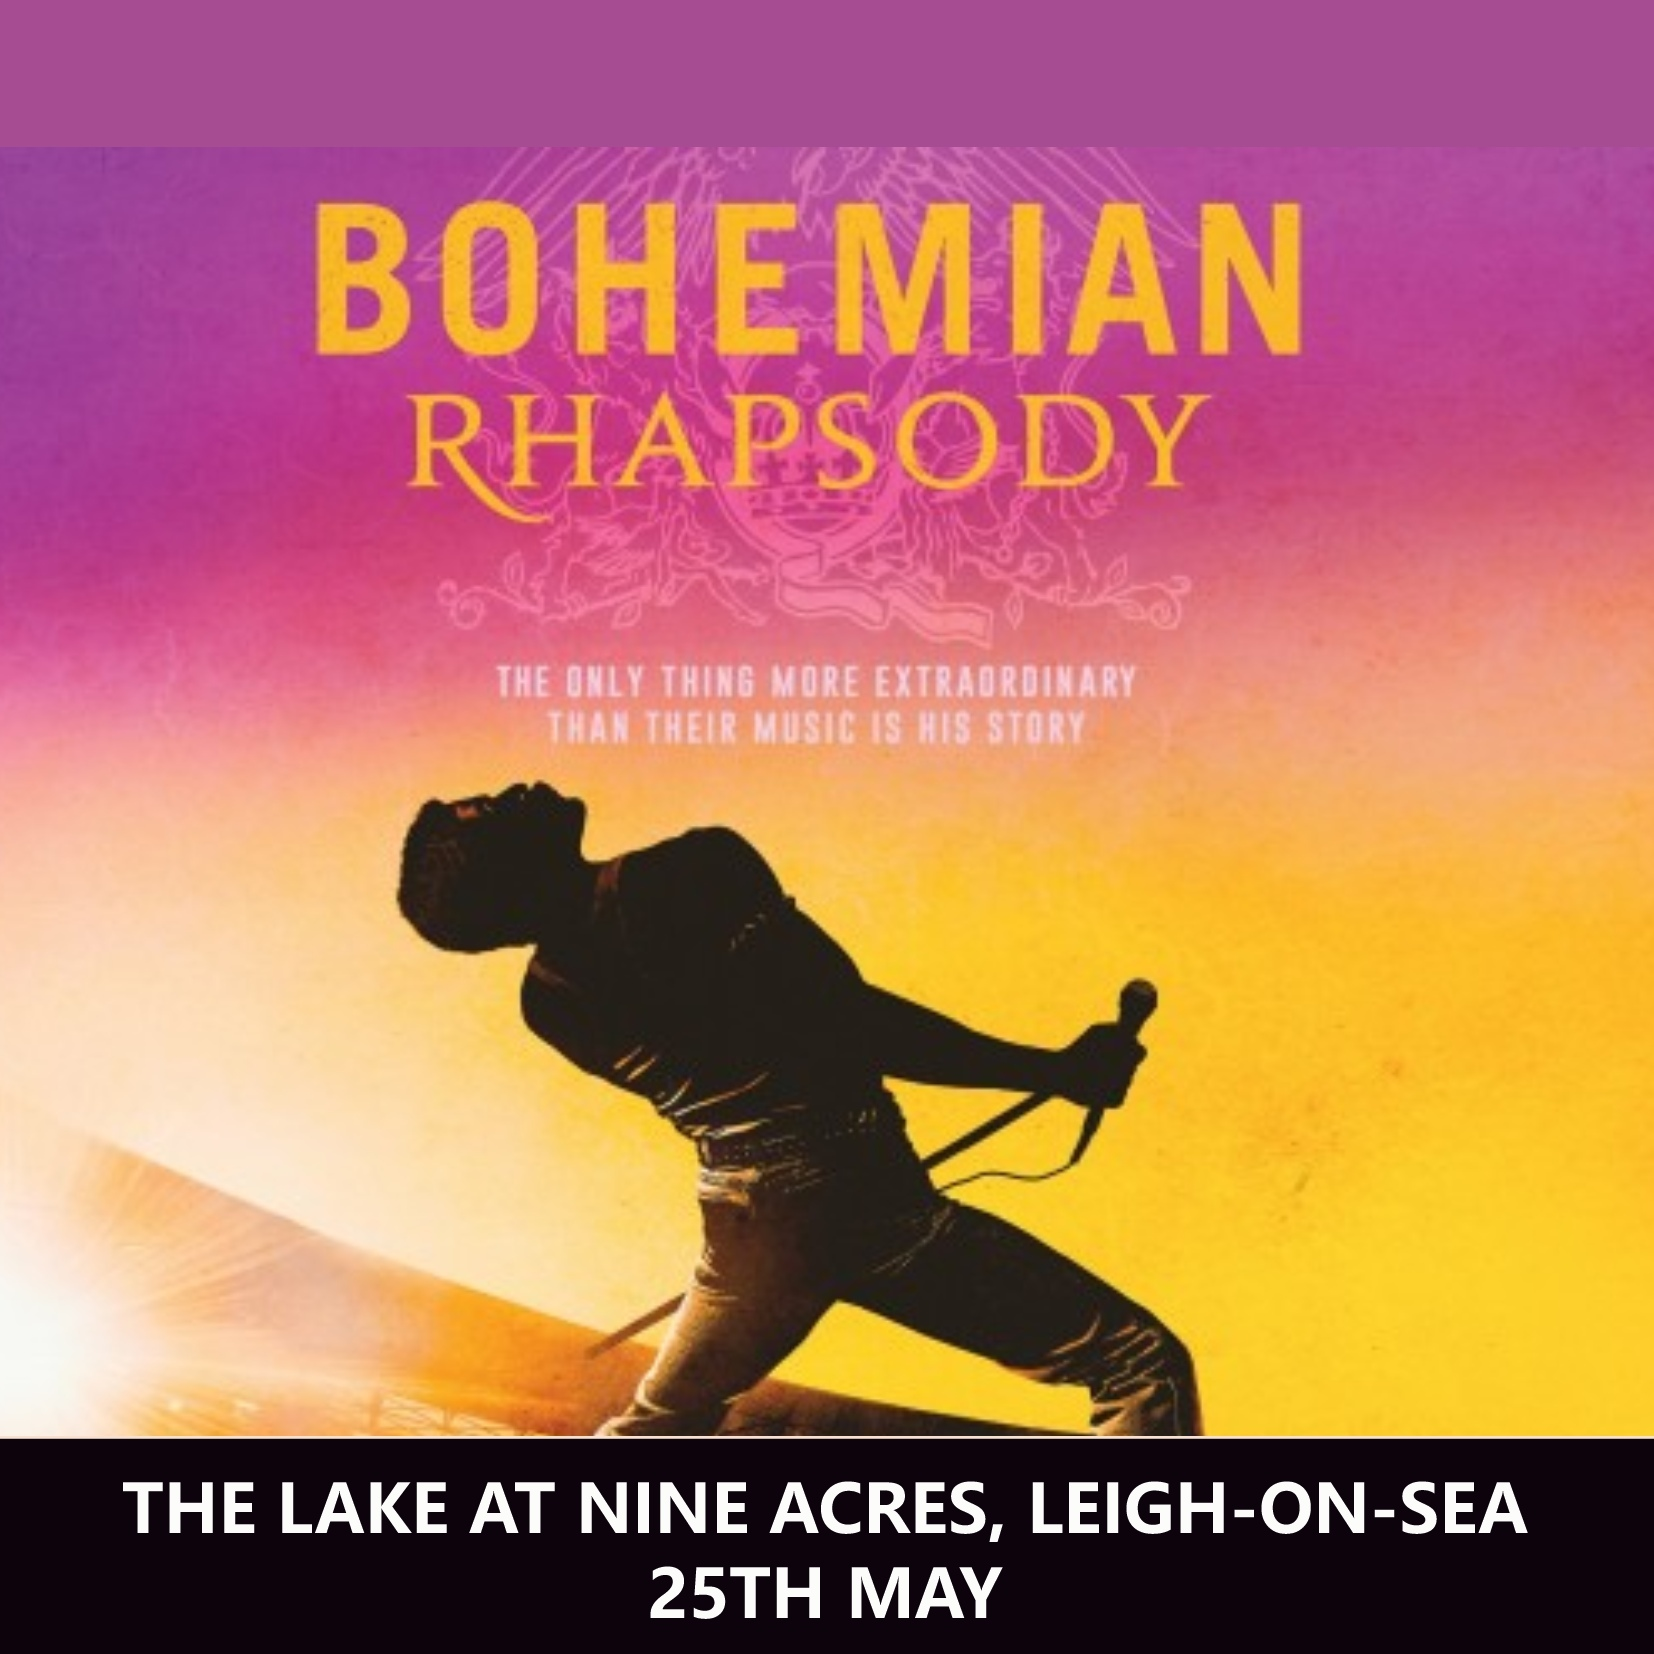 BOHEMIAN RHAPSODY @ THE LAKE NINE ACRES 00131